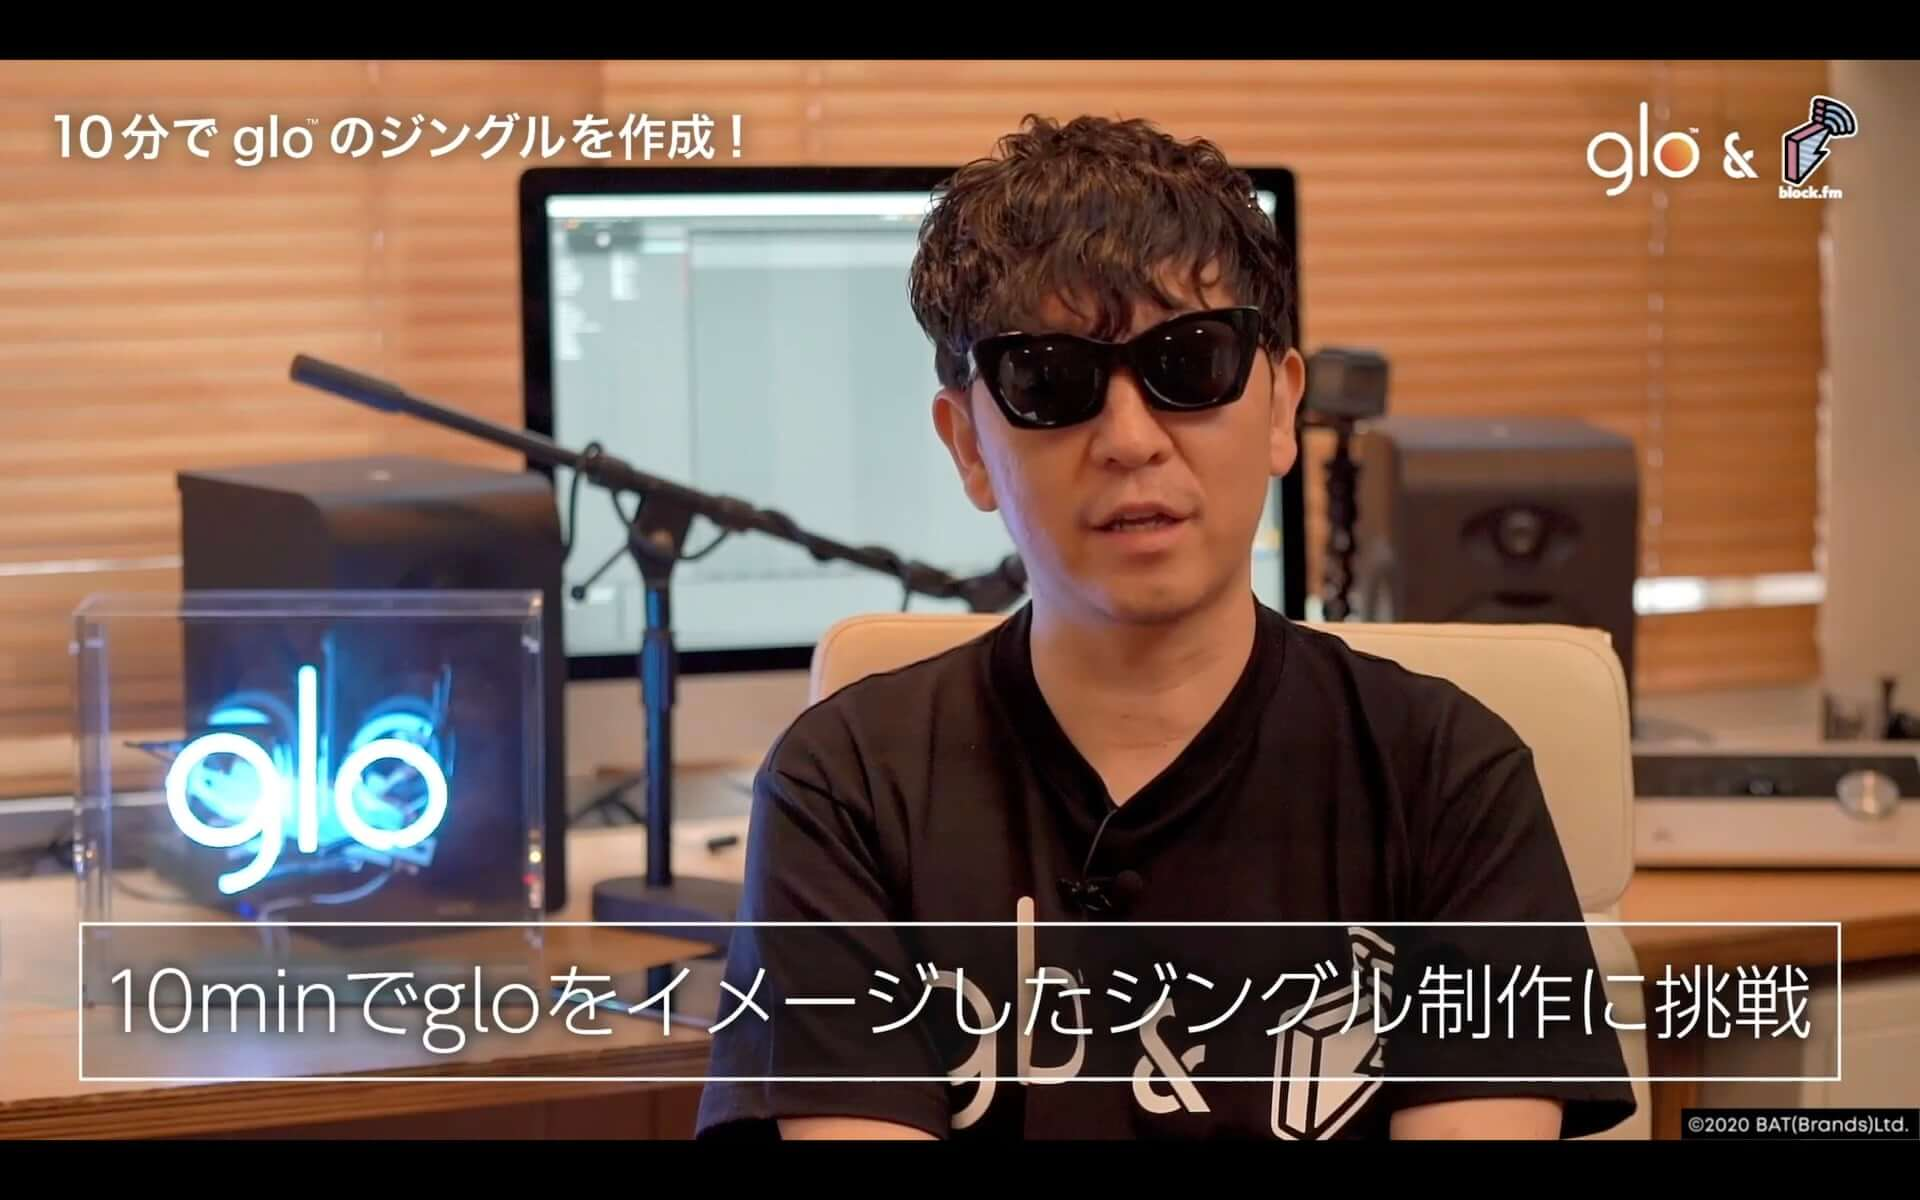 Seiho、tofubeats、Yamato、☆Taku Takahashiが様々なお題に挑戦!glo™とblock.fmが贈る動画シリーズが公開 music200916_glo-blockfm_12-1920x1200